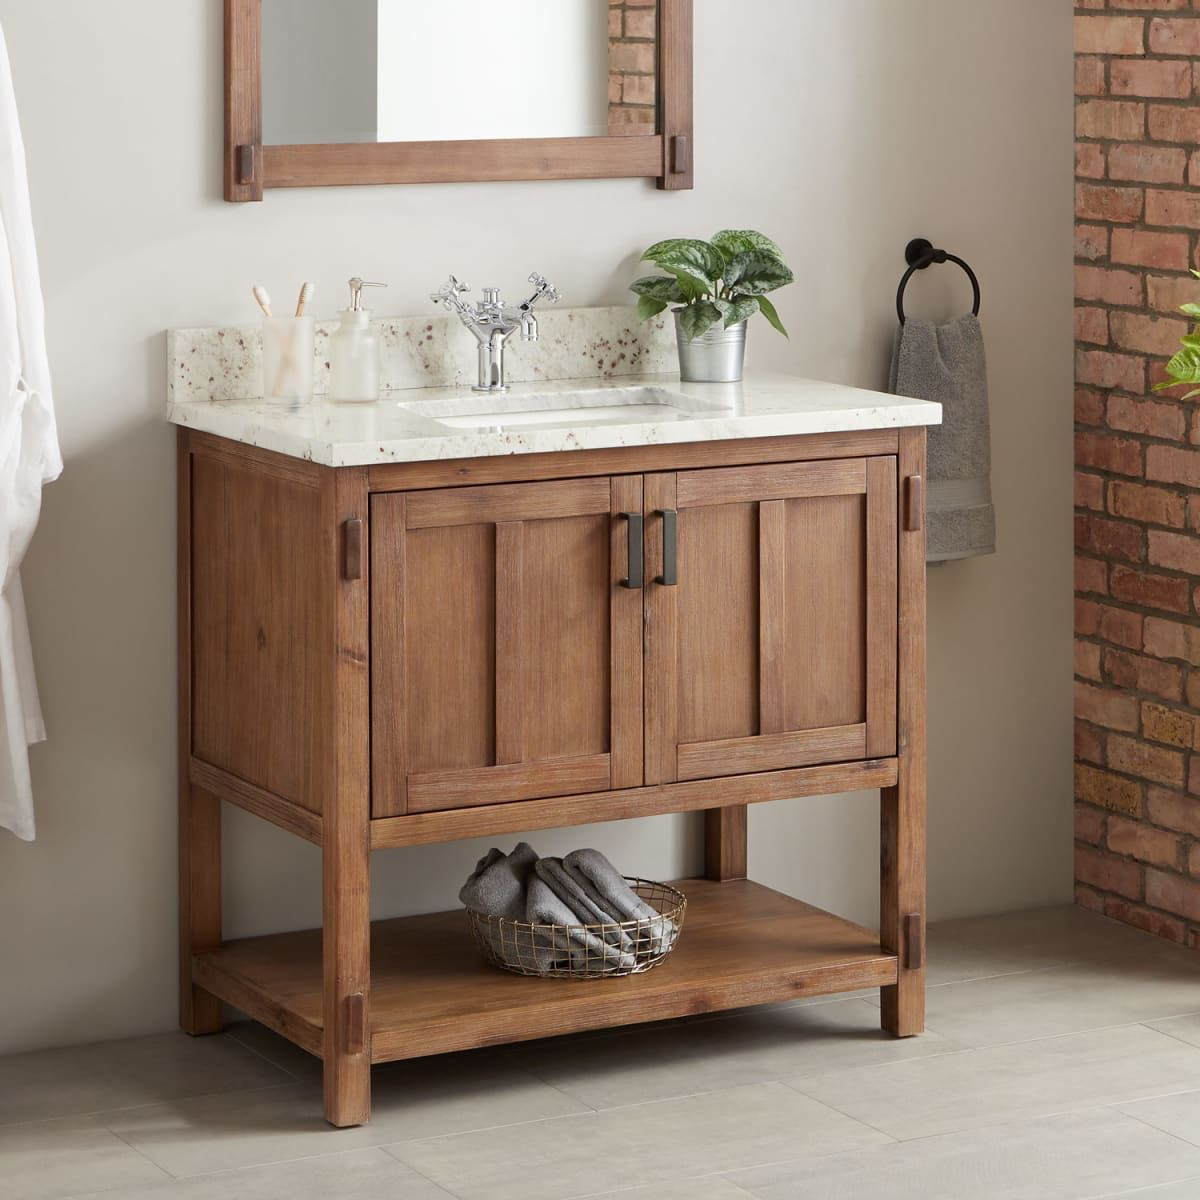 Signature Hardware 440201 Build Com Wooden Bathroom Vanity